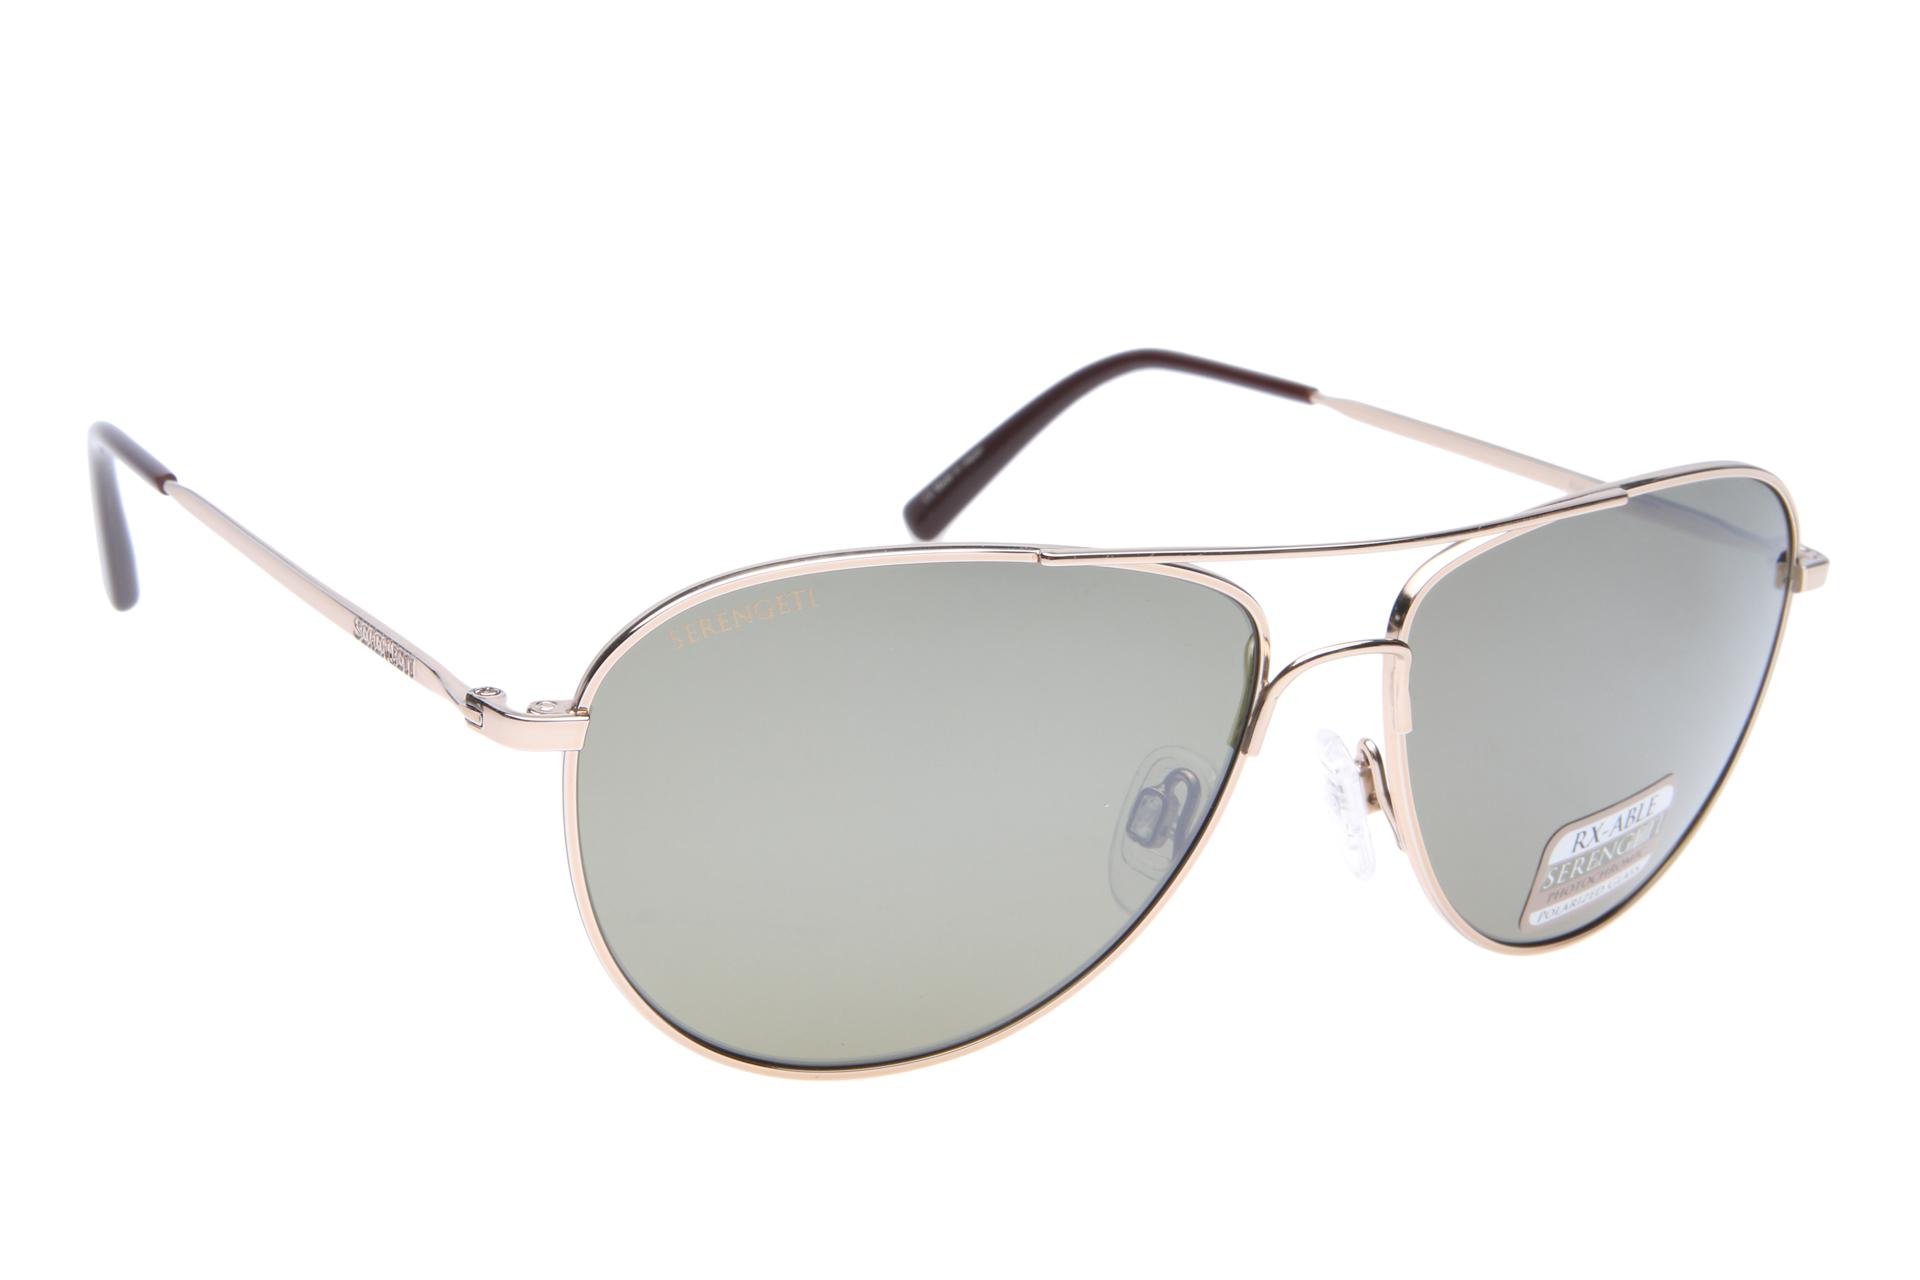 fcf76d05164416 Serengeti Alghero 8542 (Shiny Soft Gold) Gepolariseerd zonnebril